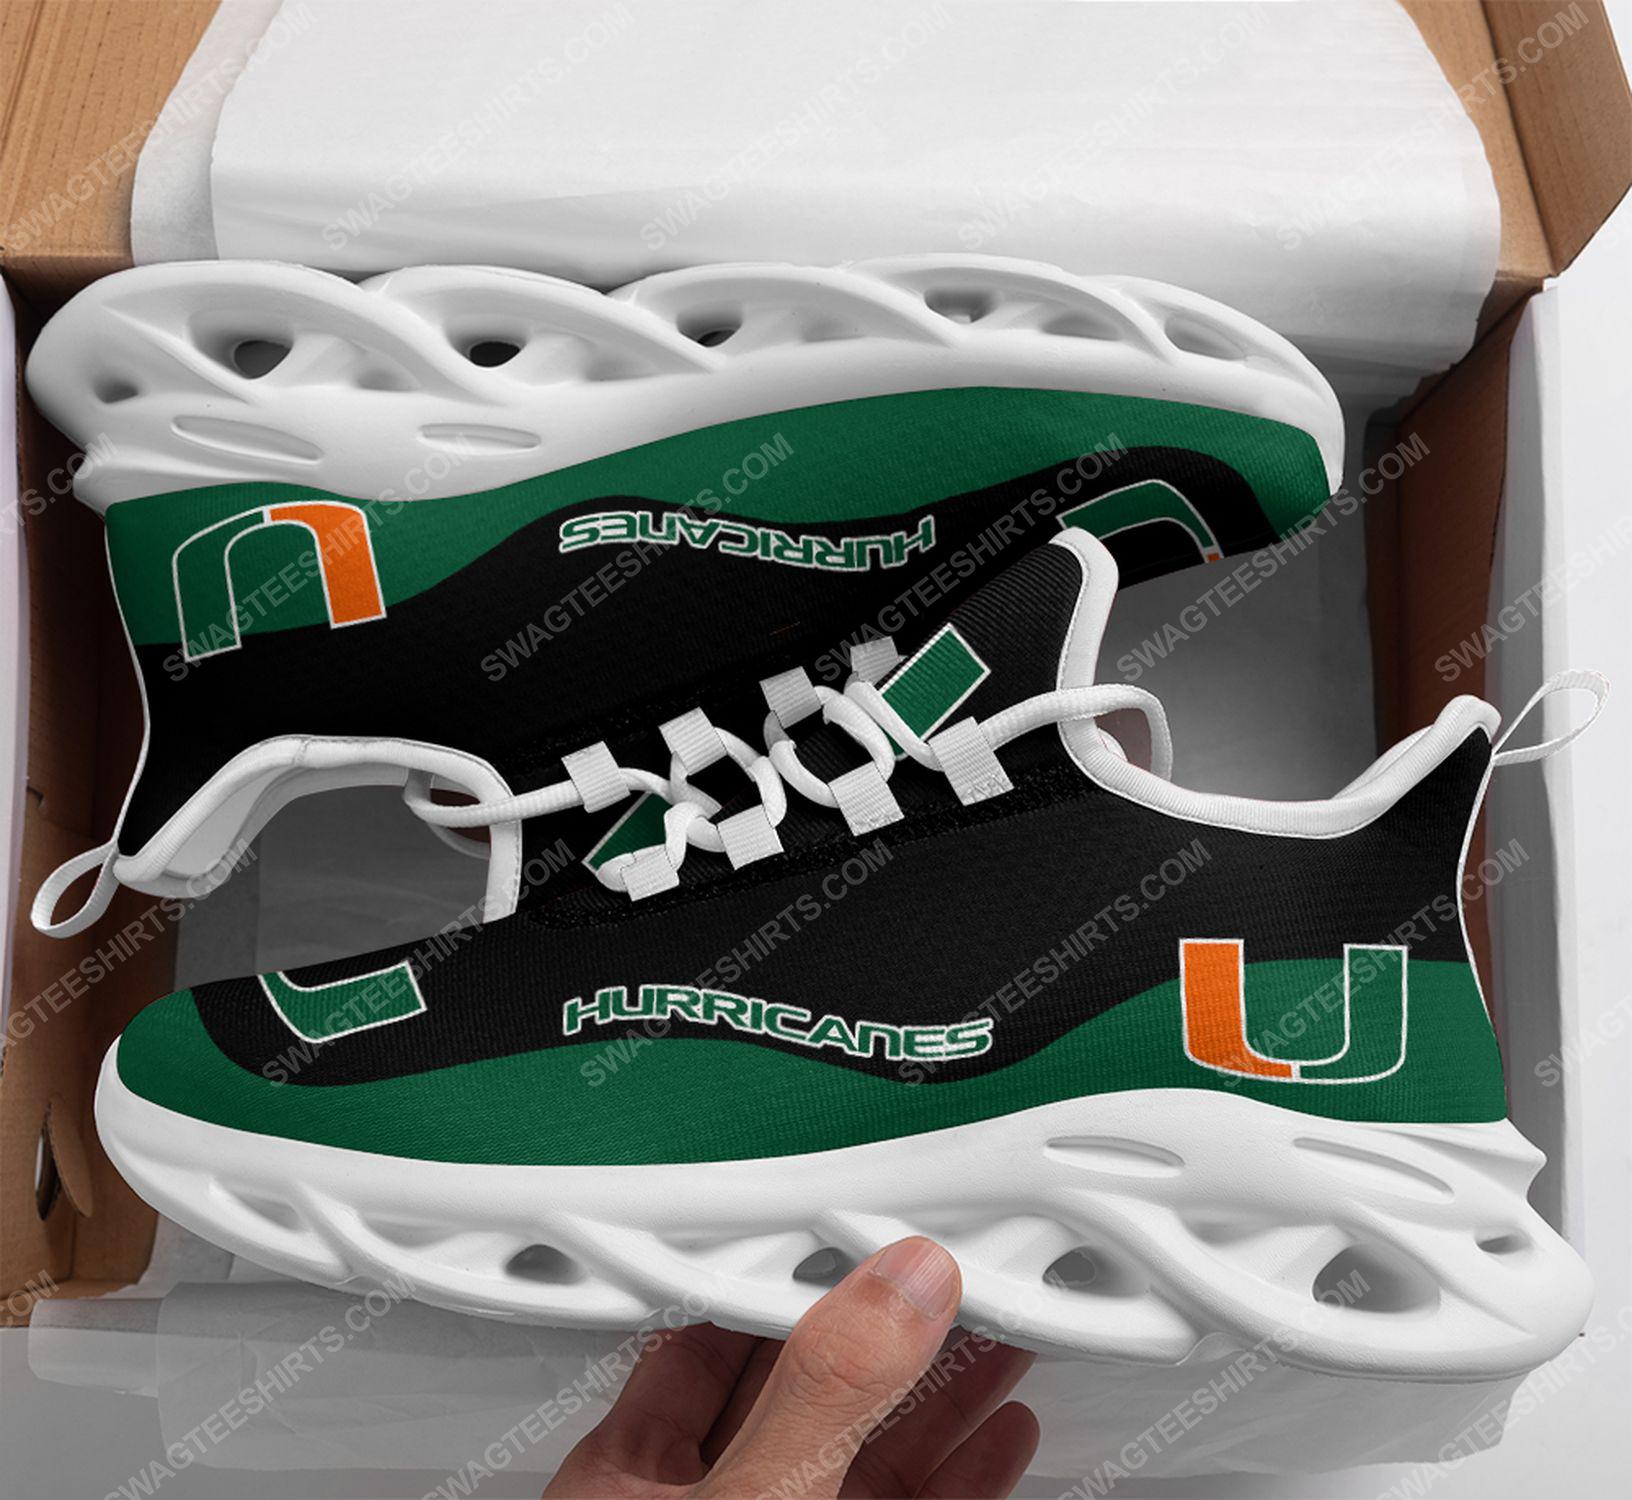 The miami hurricanes football team max soul shoes 1